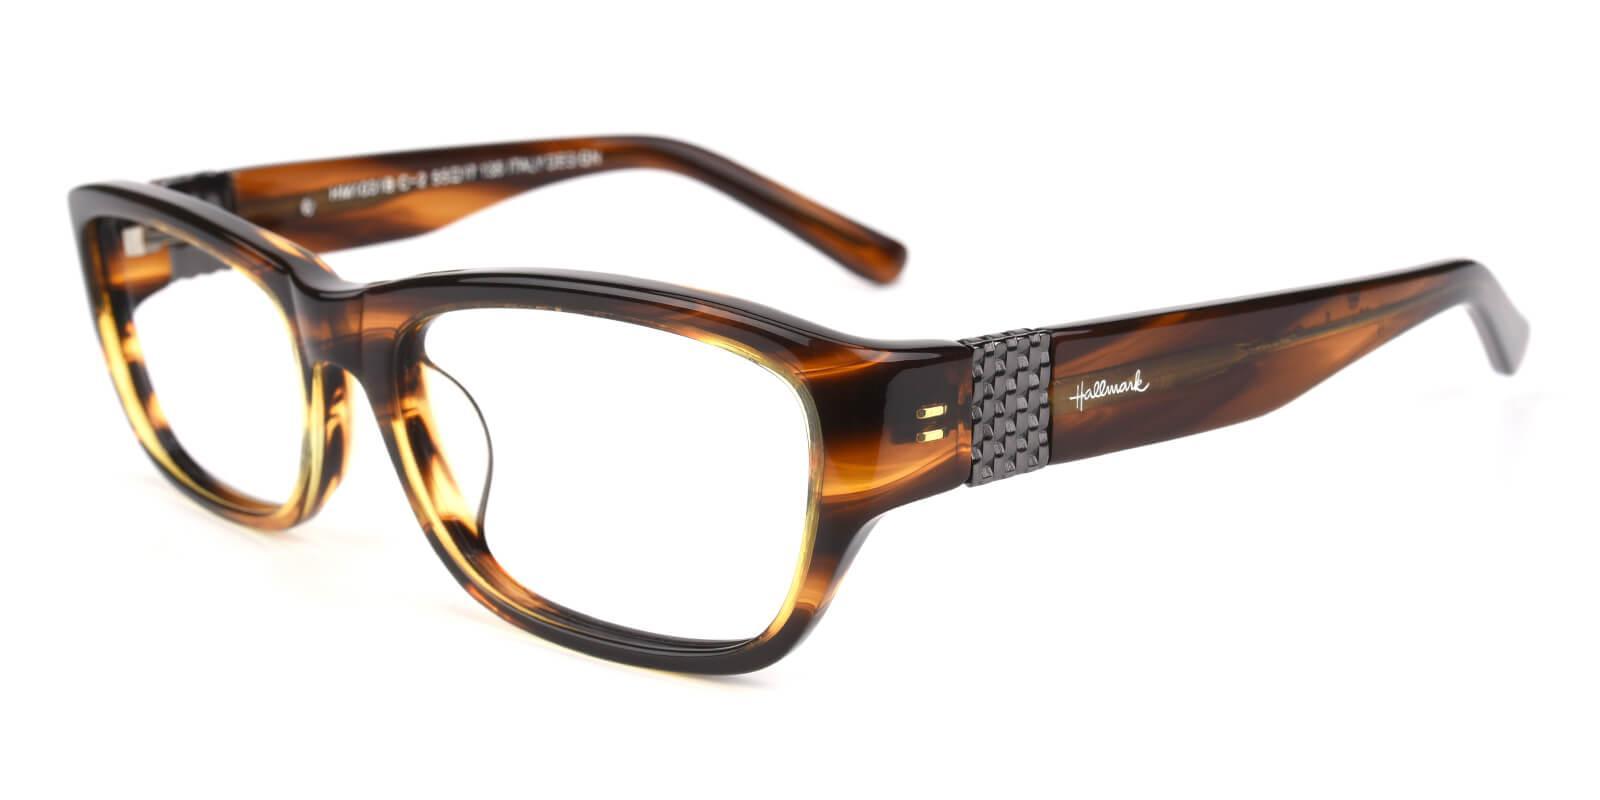 Travis-Tortoise-Rectangle-Acetate-Eyeglasses-additional1